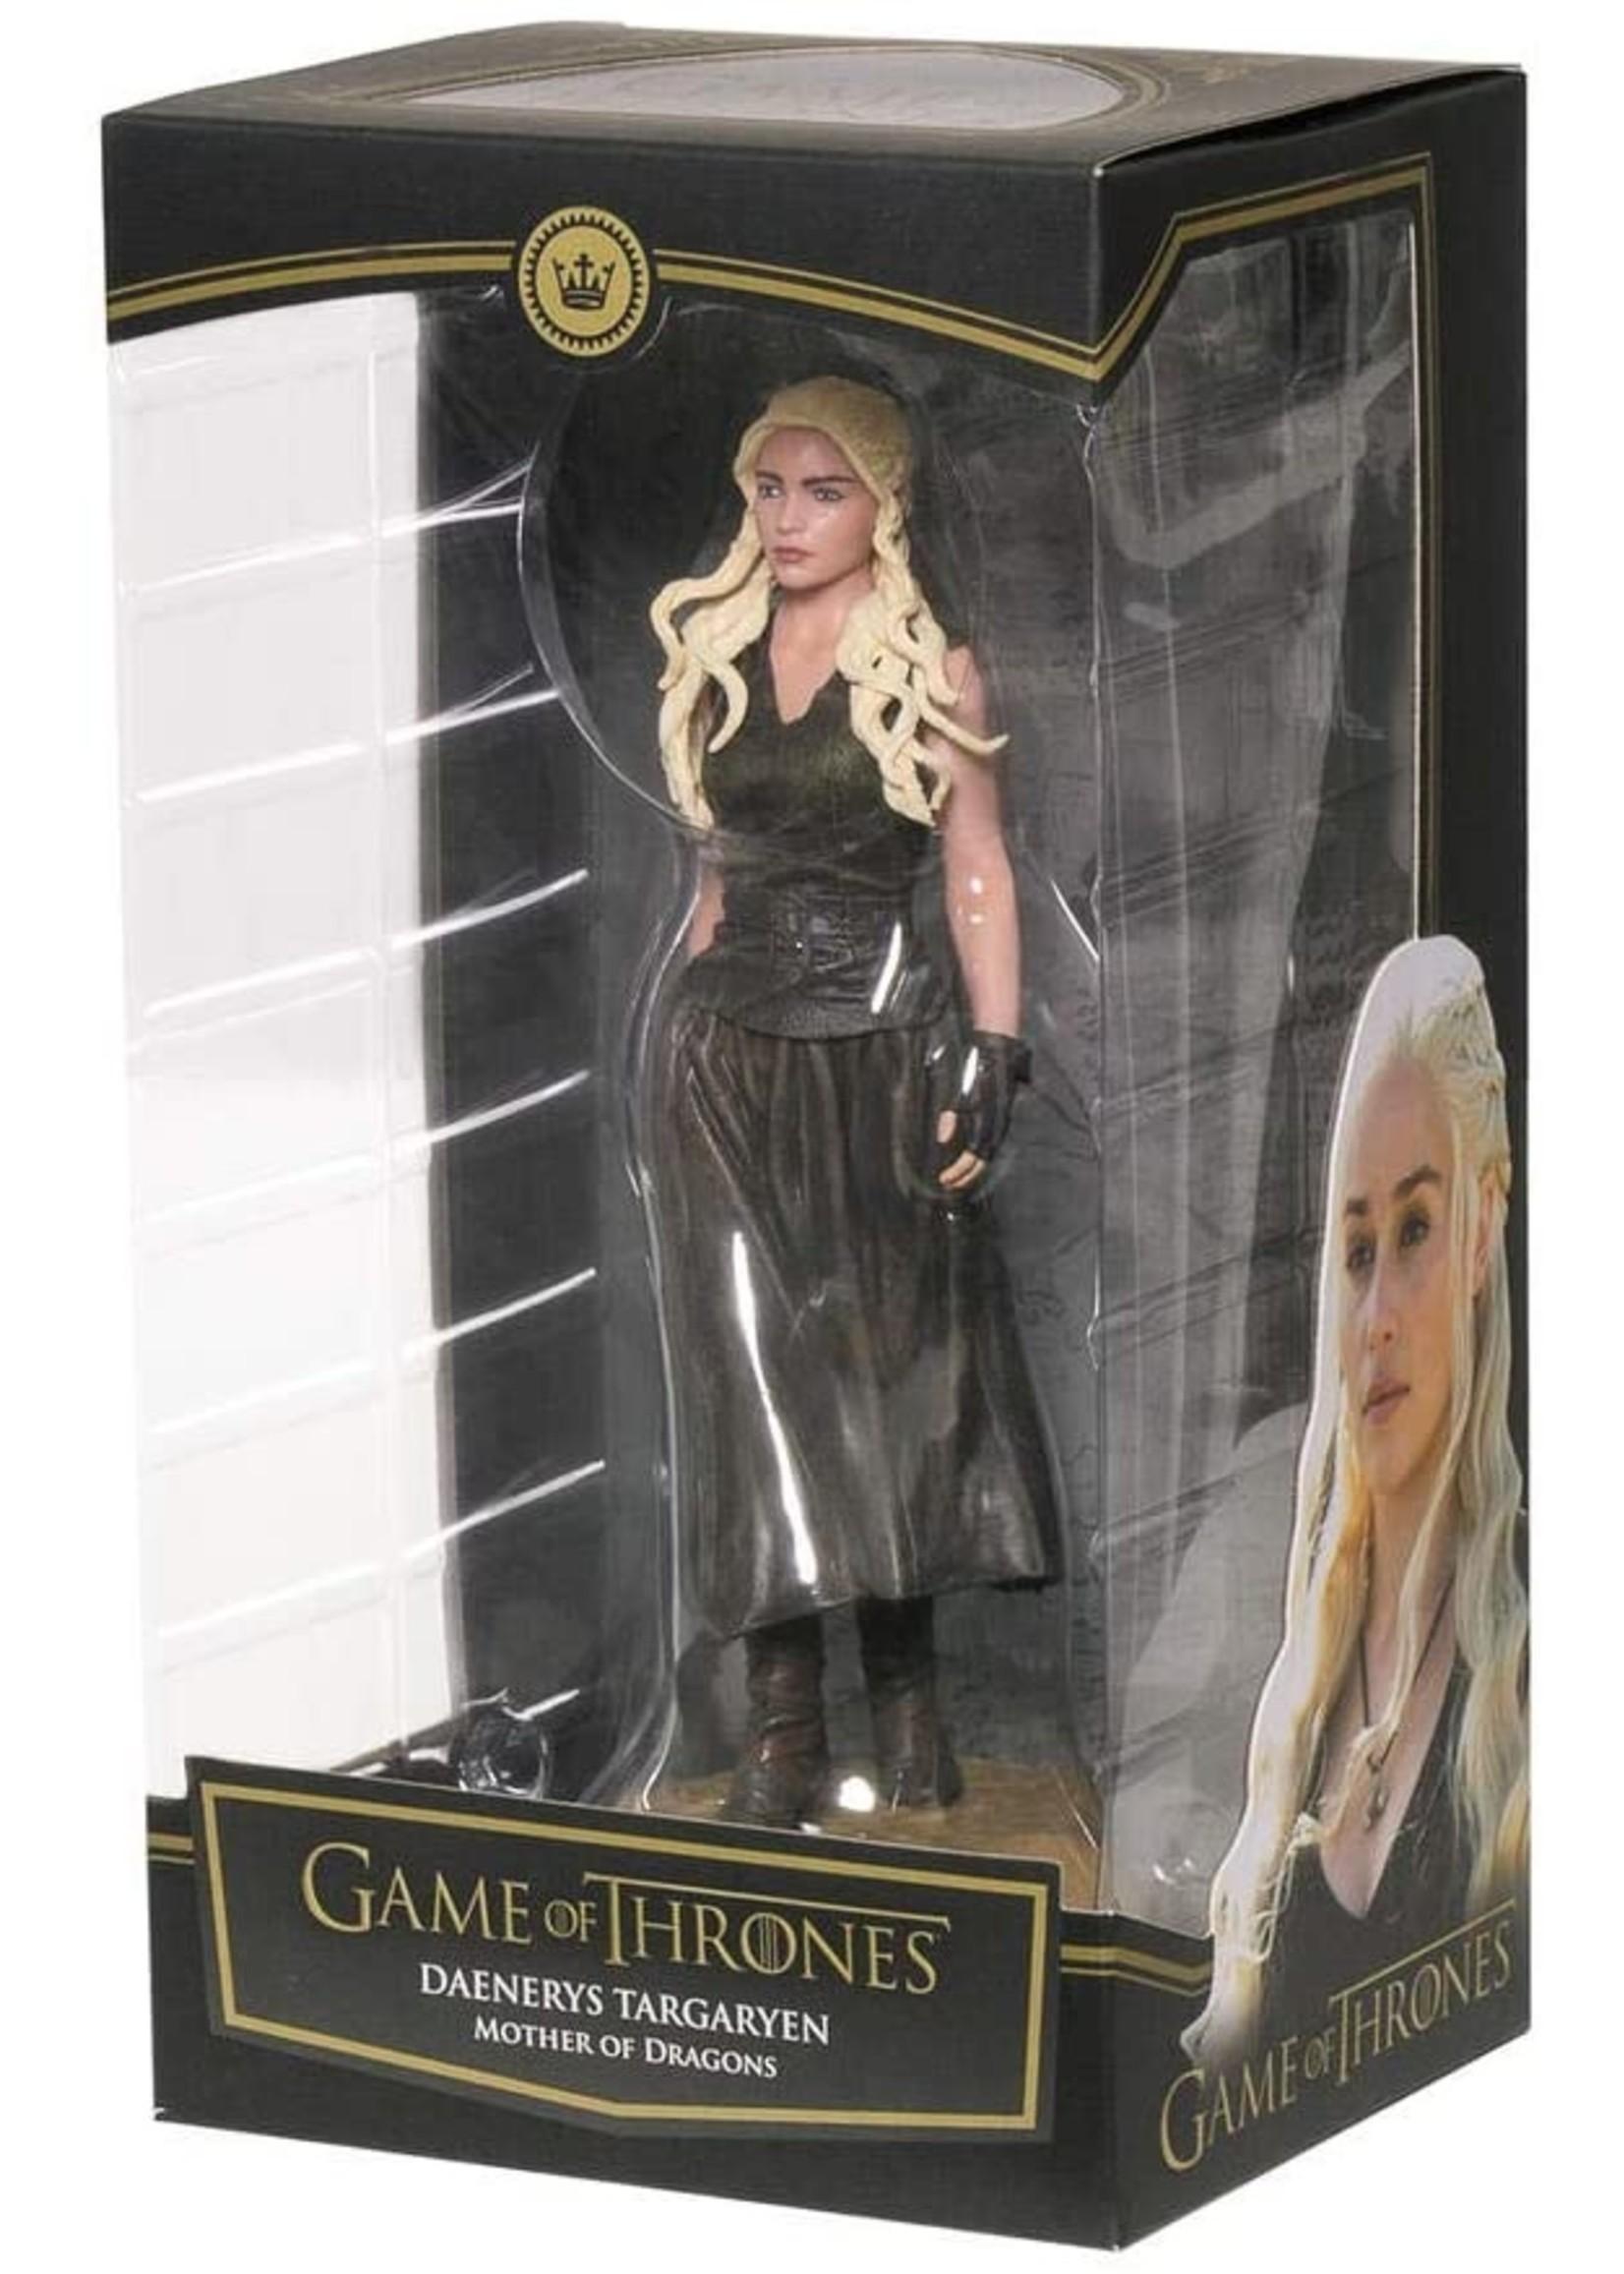 Dark Horse Deluxe Dark Horse Deluxe Game of Thrones: Daenerys Targaryen Mother of Dragons Figure